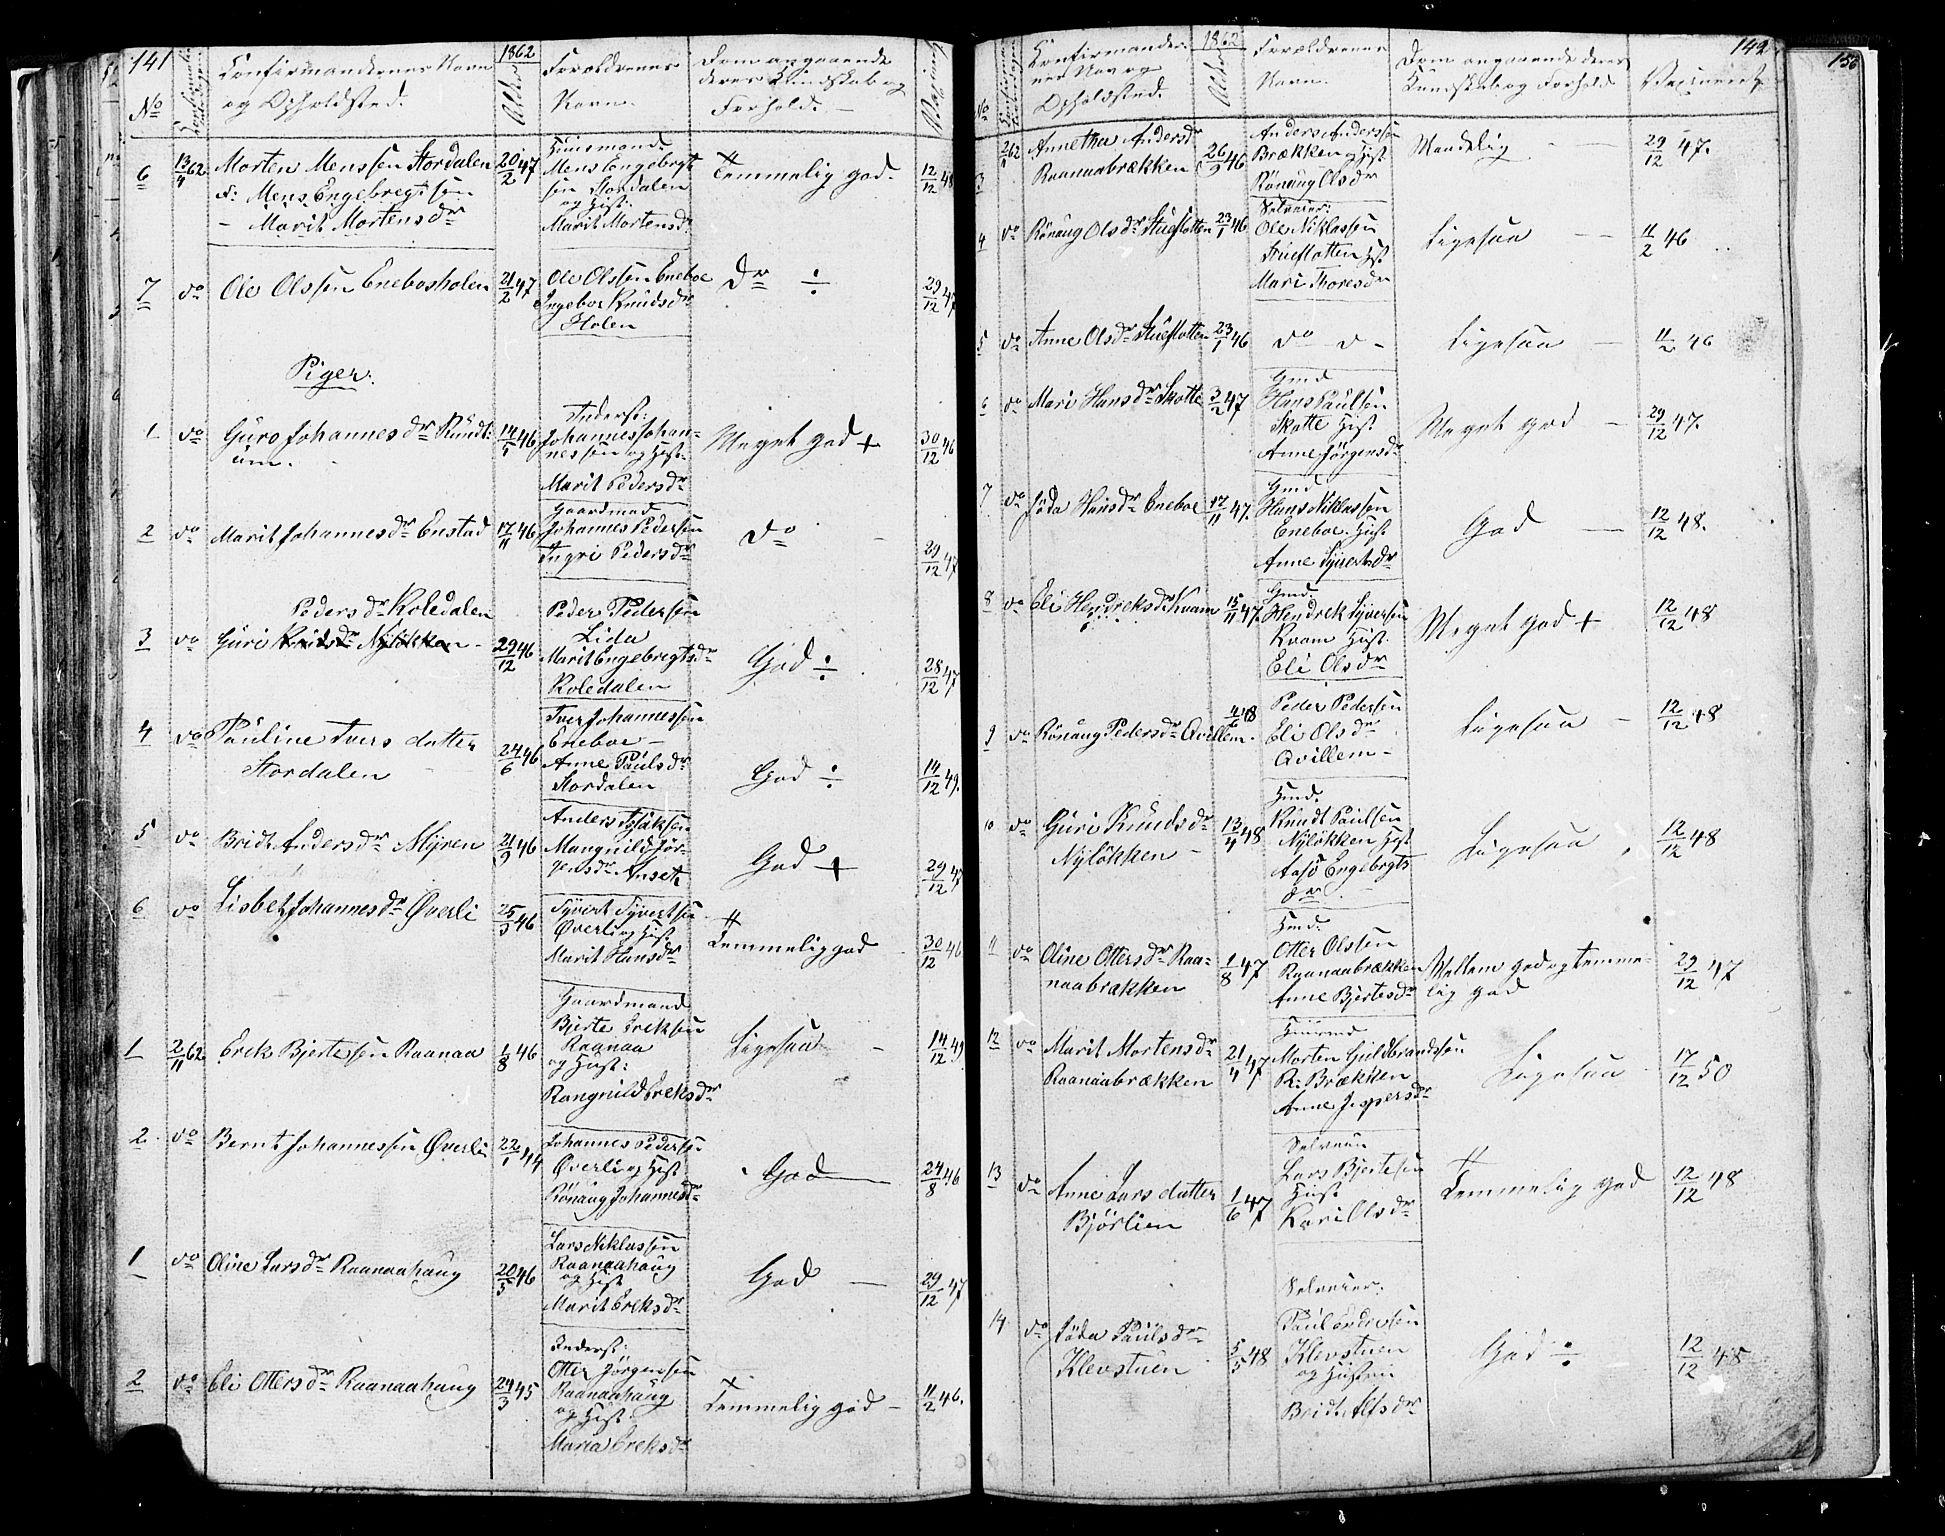 SAH, Lesja prestekontor, Klokkerbok nr. 4, 1842-1871, s. 141-142